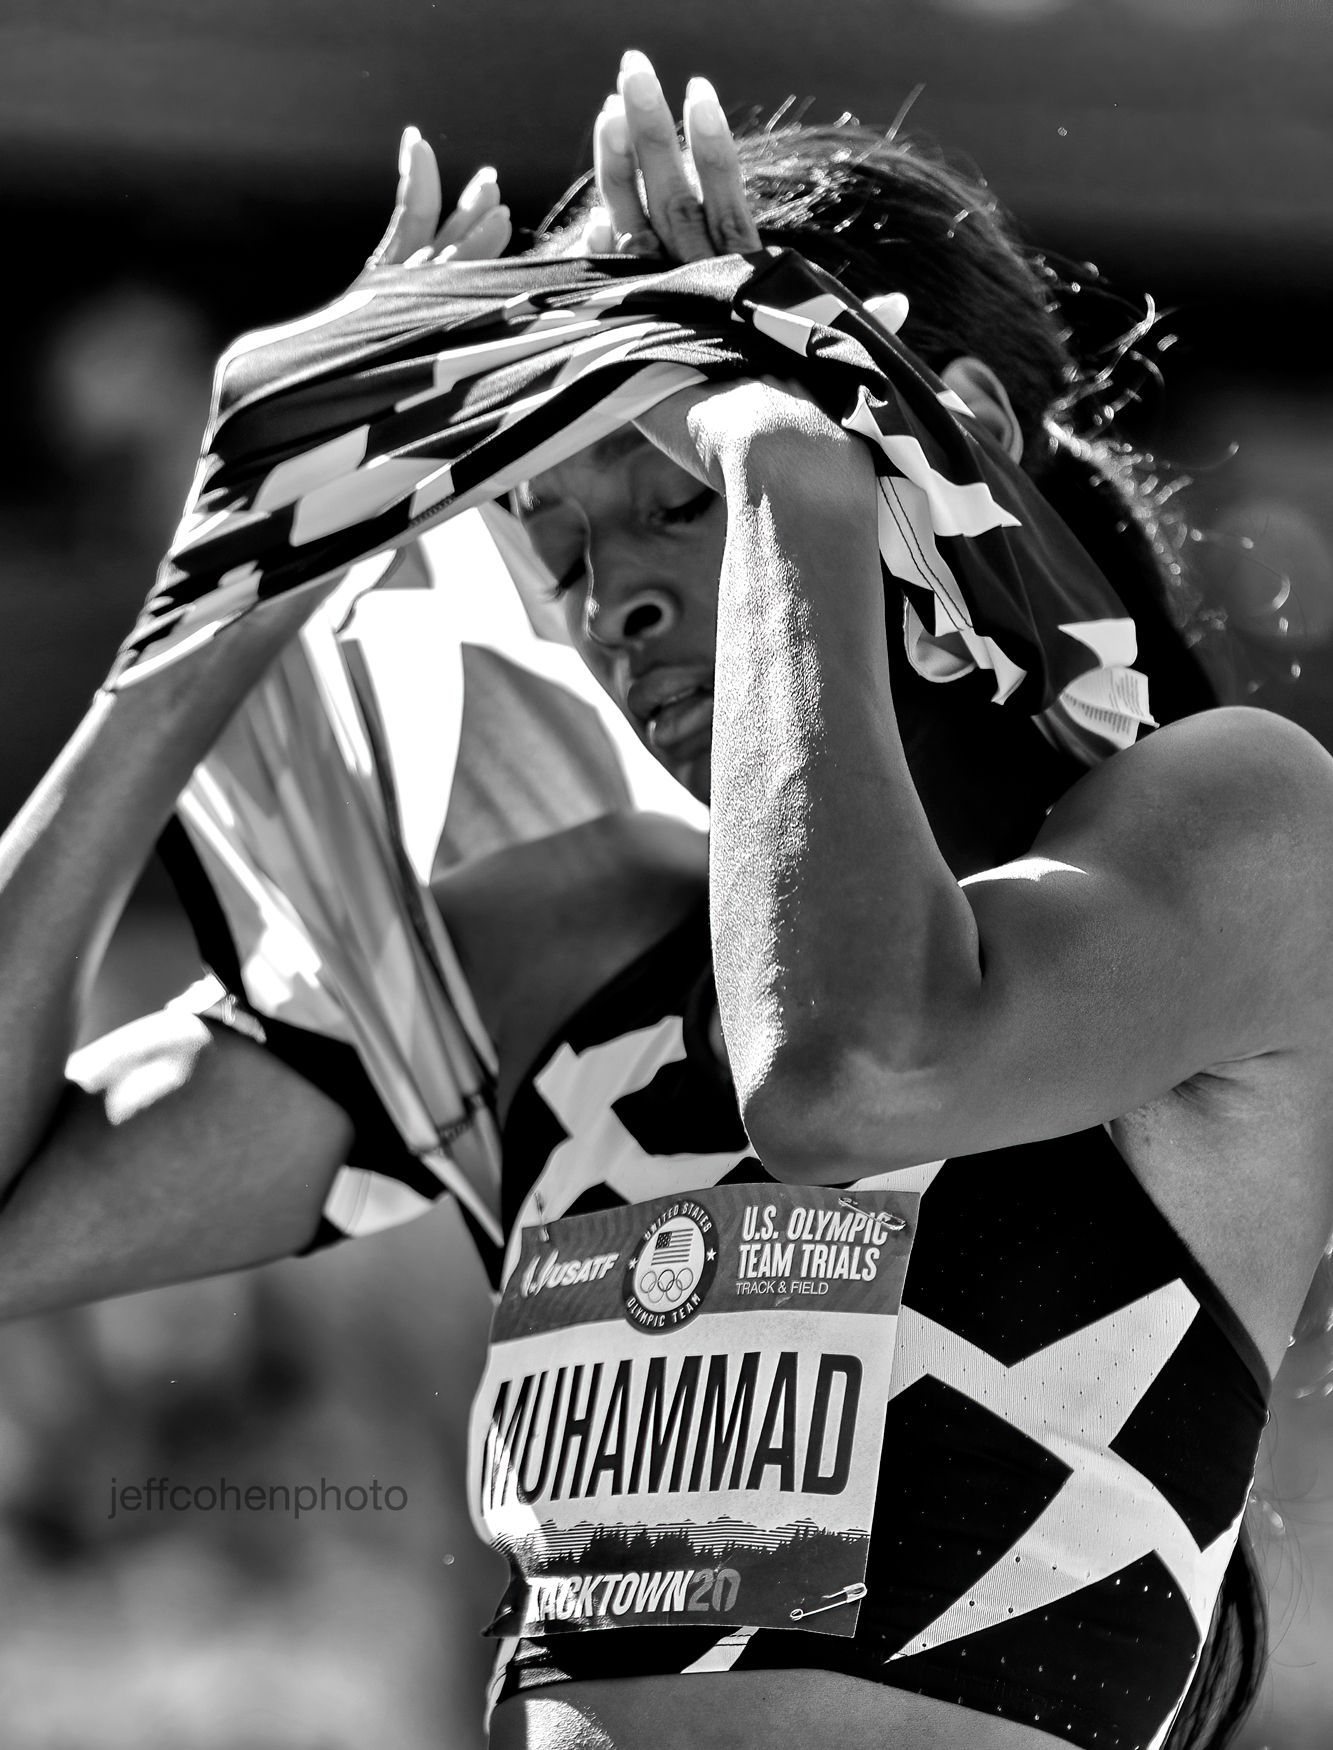 muhammad-400hw-port-2021-US-Oly-Trials--day-6-2278-jeff-cohen-photo---copy-web.jpg